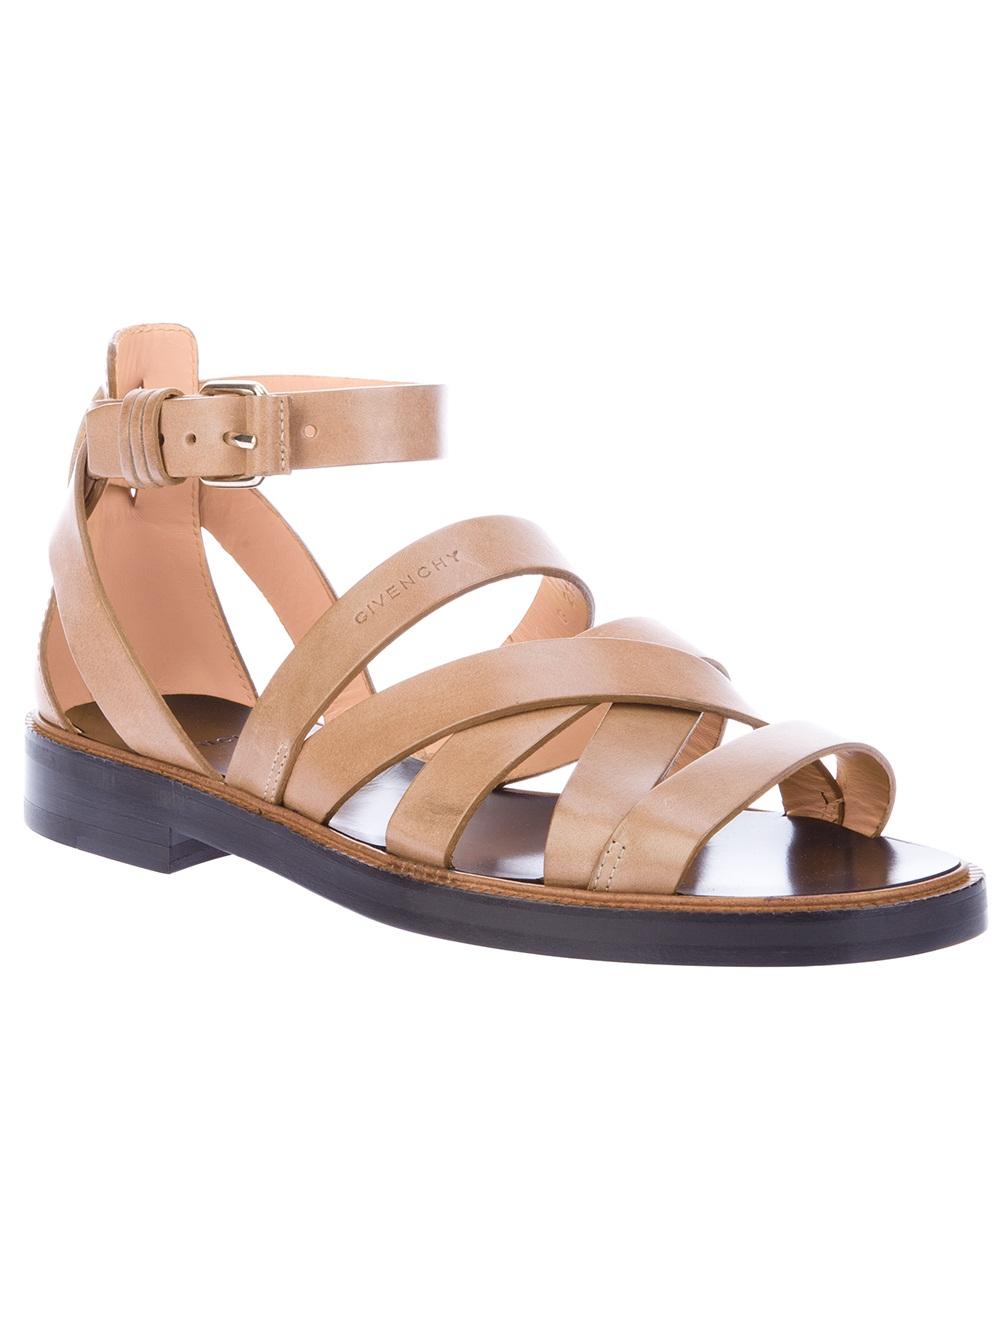 Givenchy Gladiator Sandal In Brown For Men Lyst